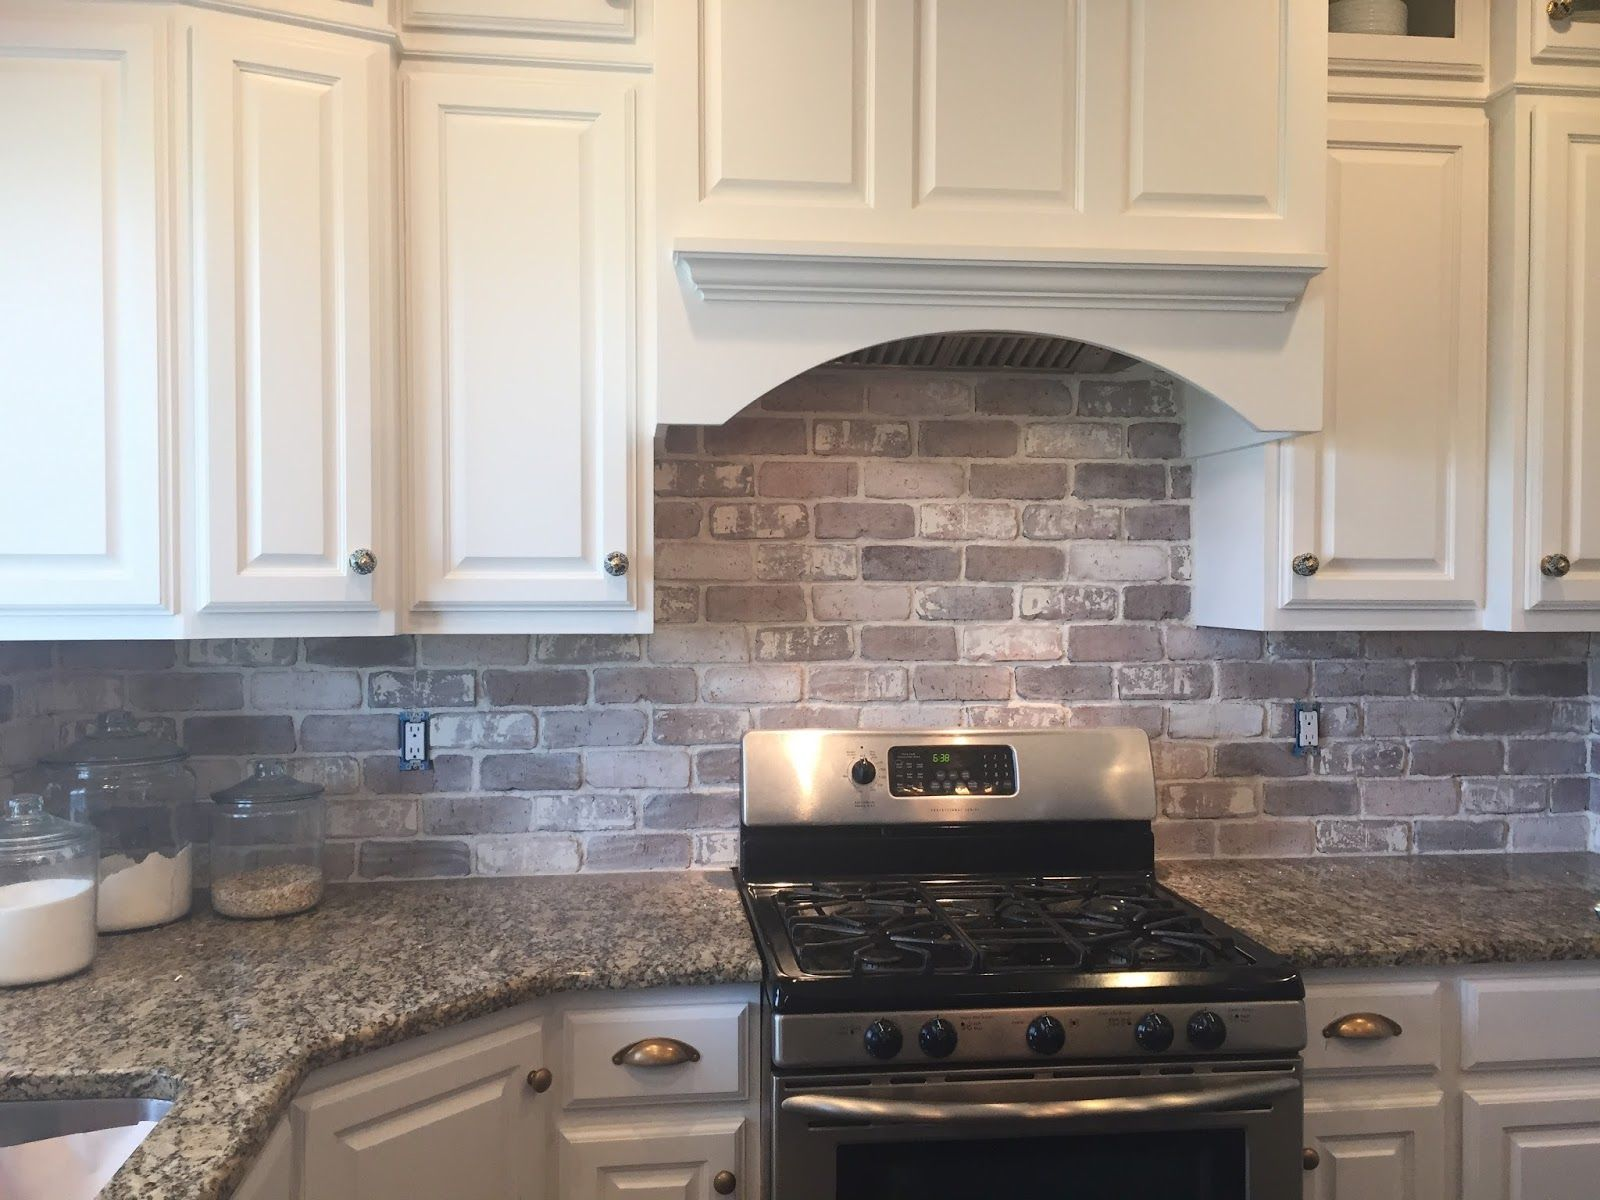 backsplash kitchen Love brick backsplash in the kitchen easy diy install with our brick panels cut them